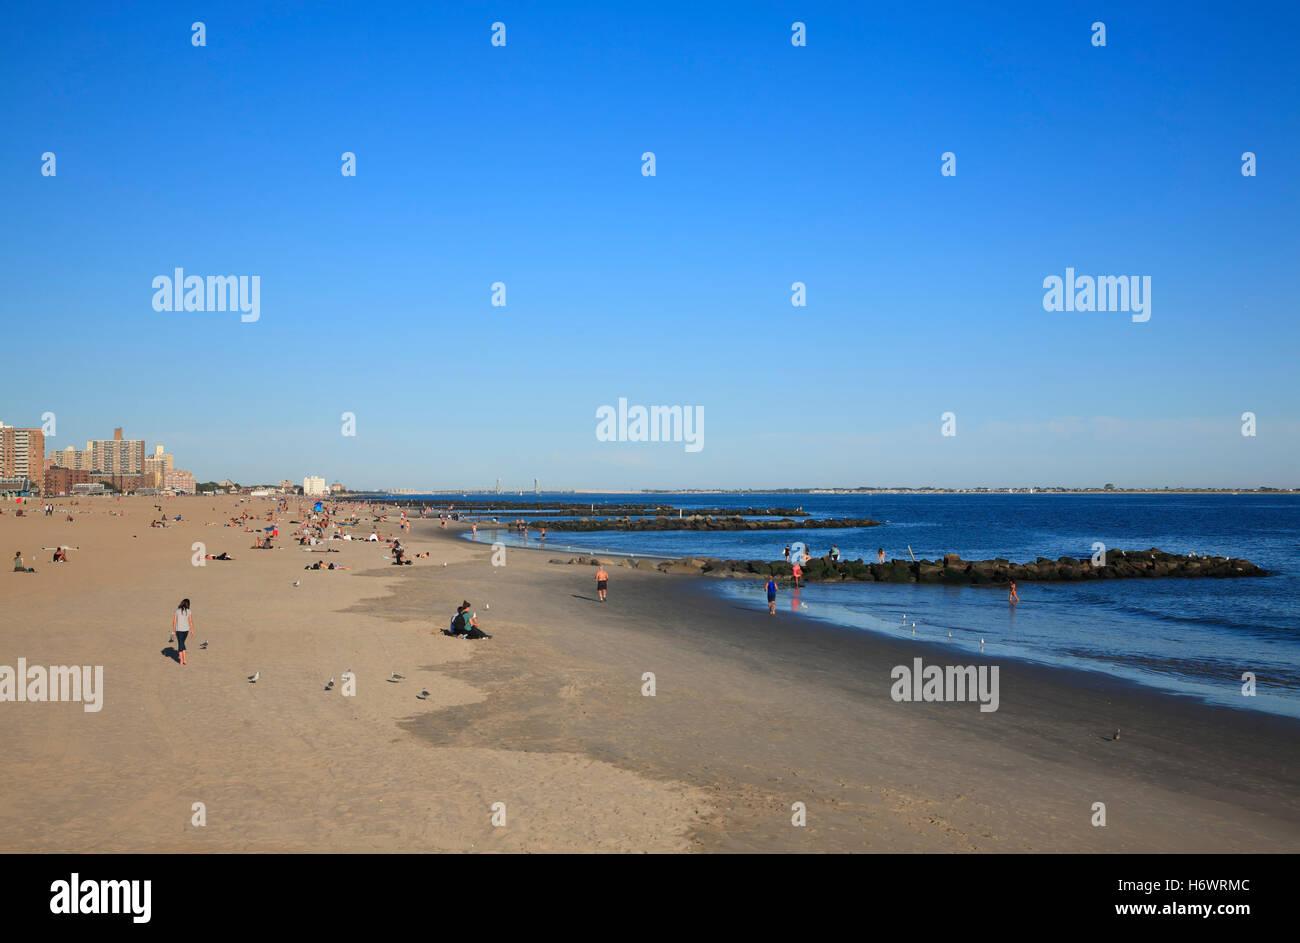 Beach, Coney Island, Brooklyn, New York, USA - Stock Image